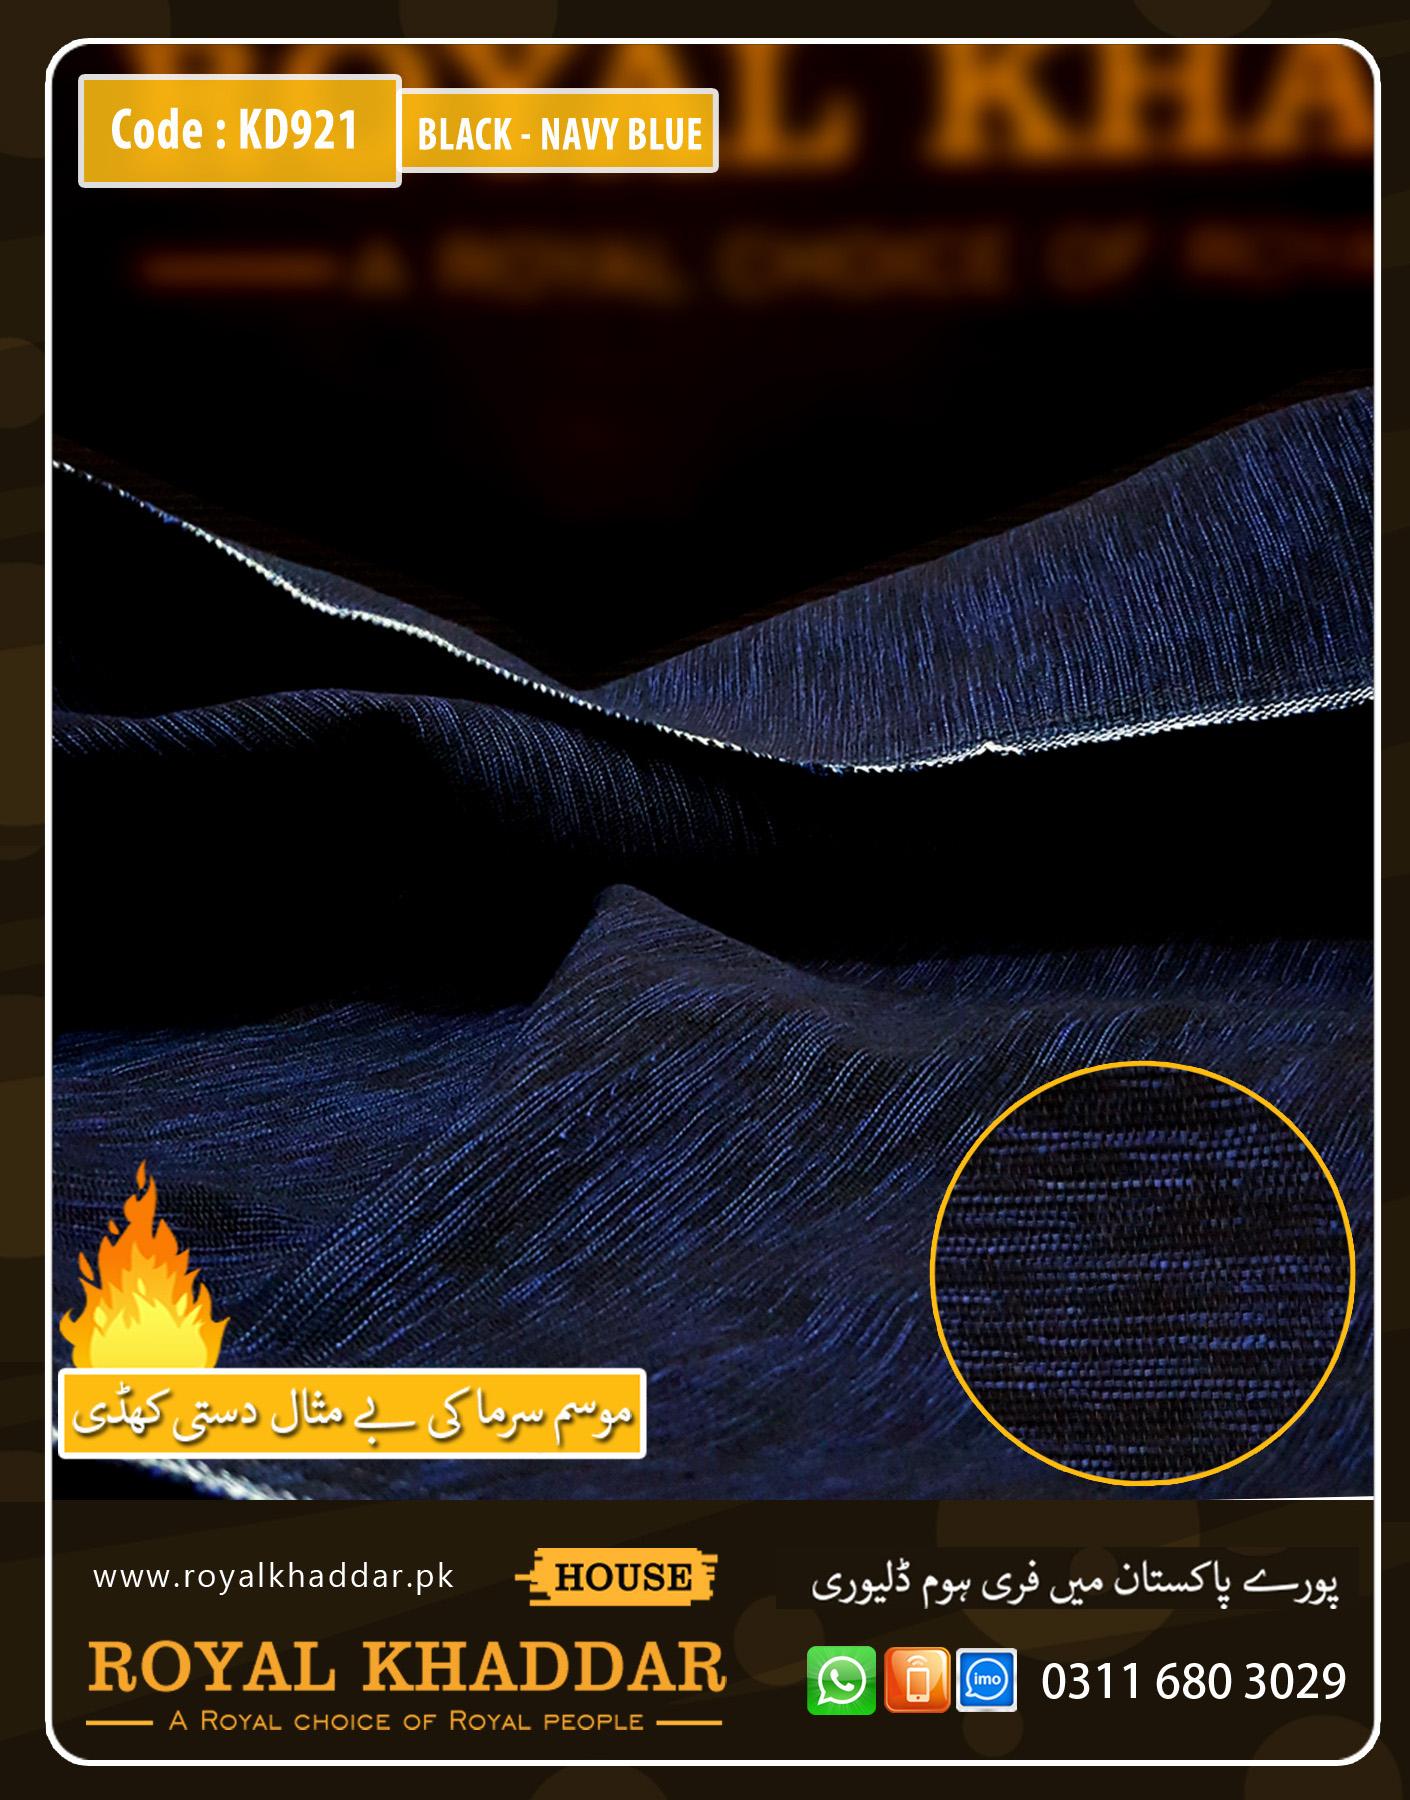 KD921 Navy Blue - Black Handmade Khaddi